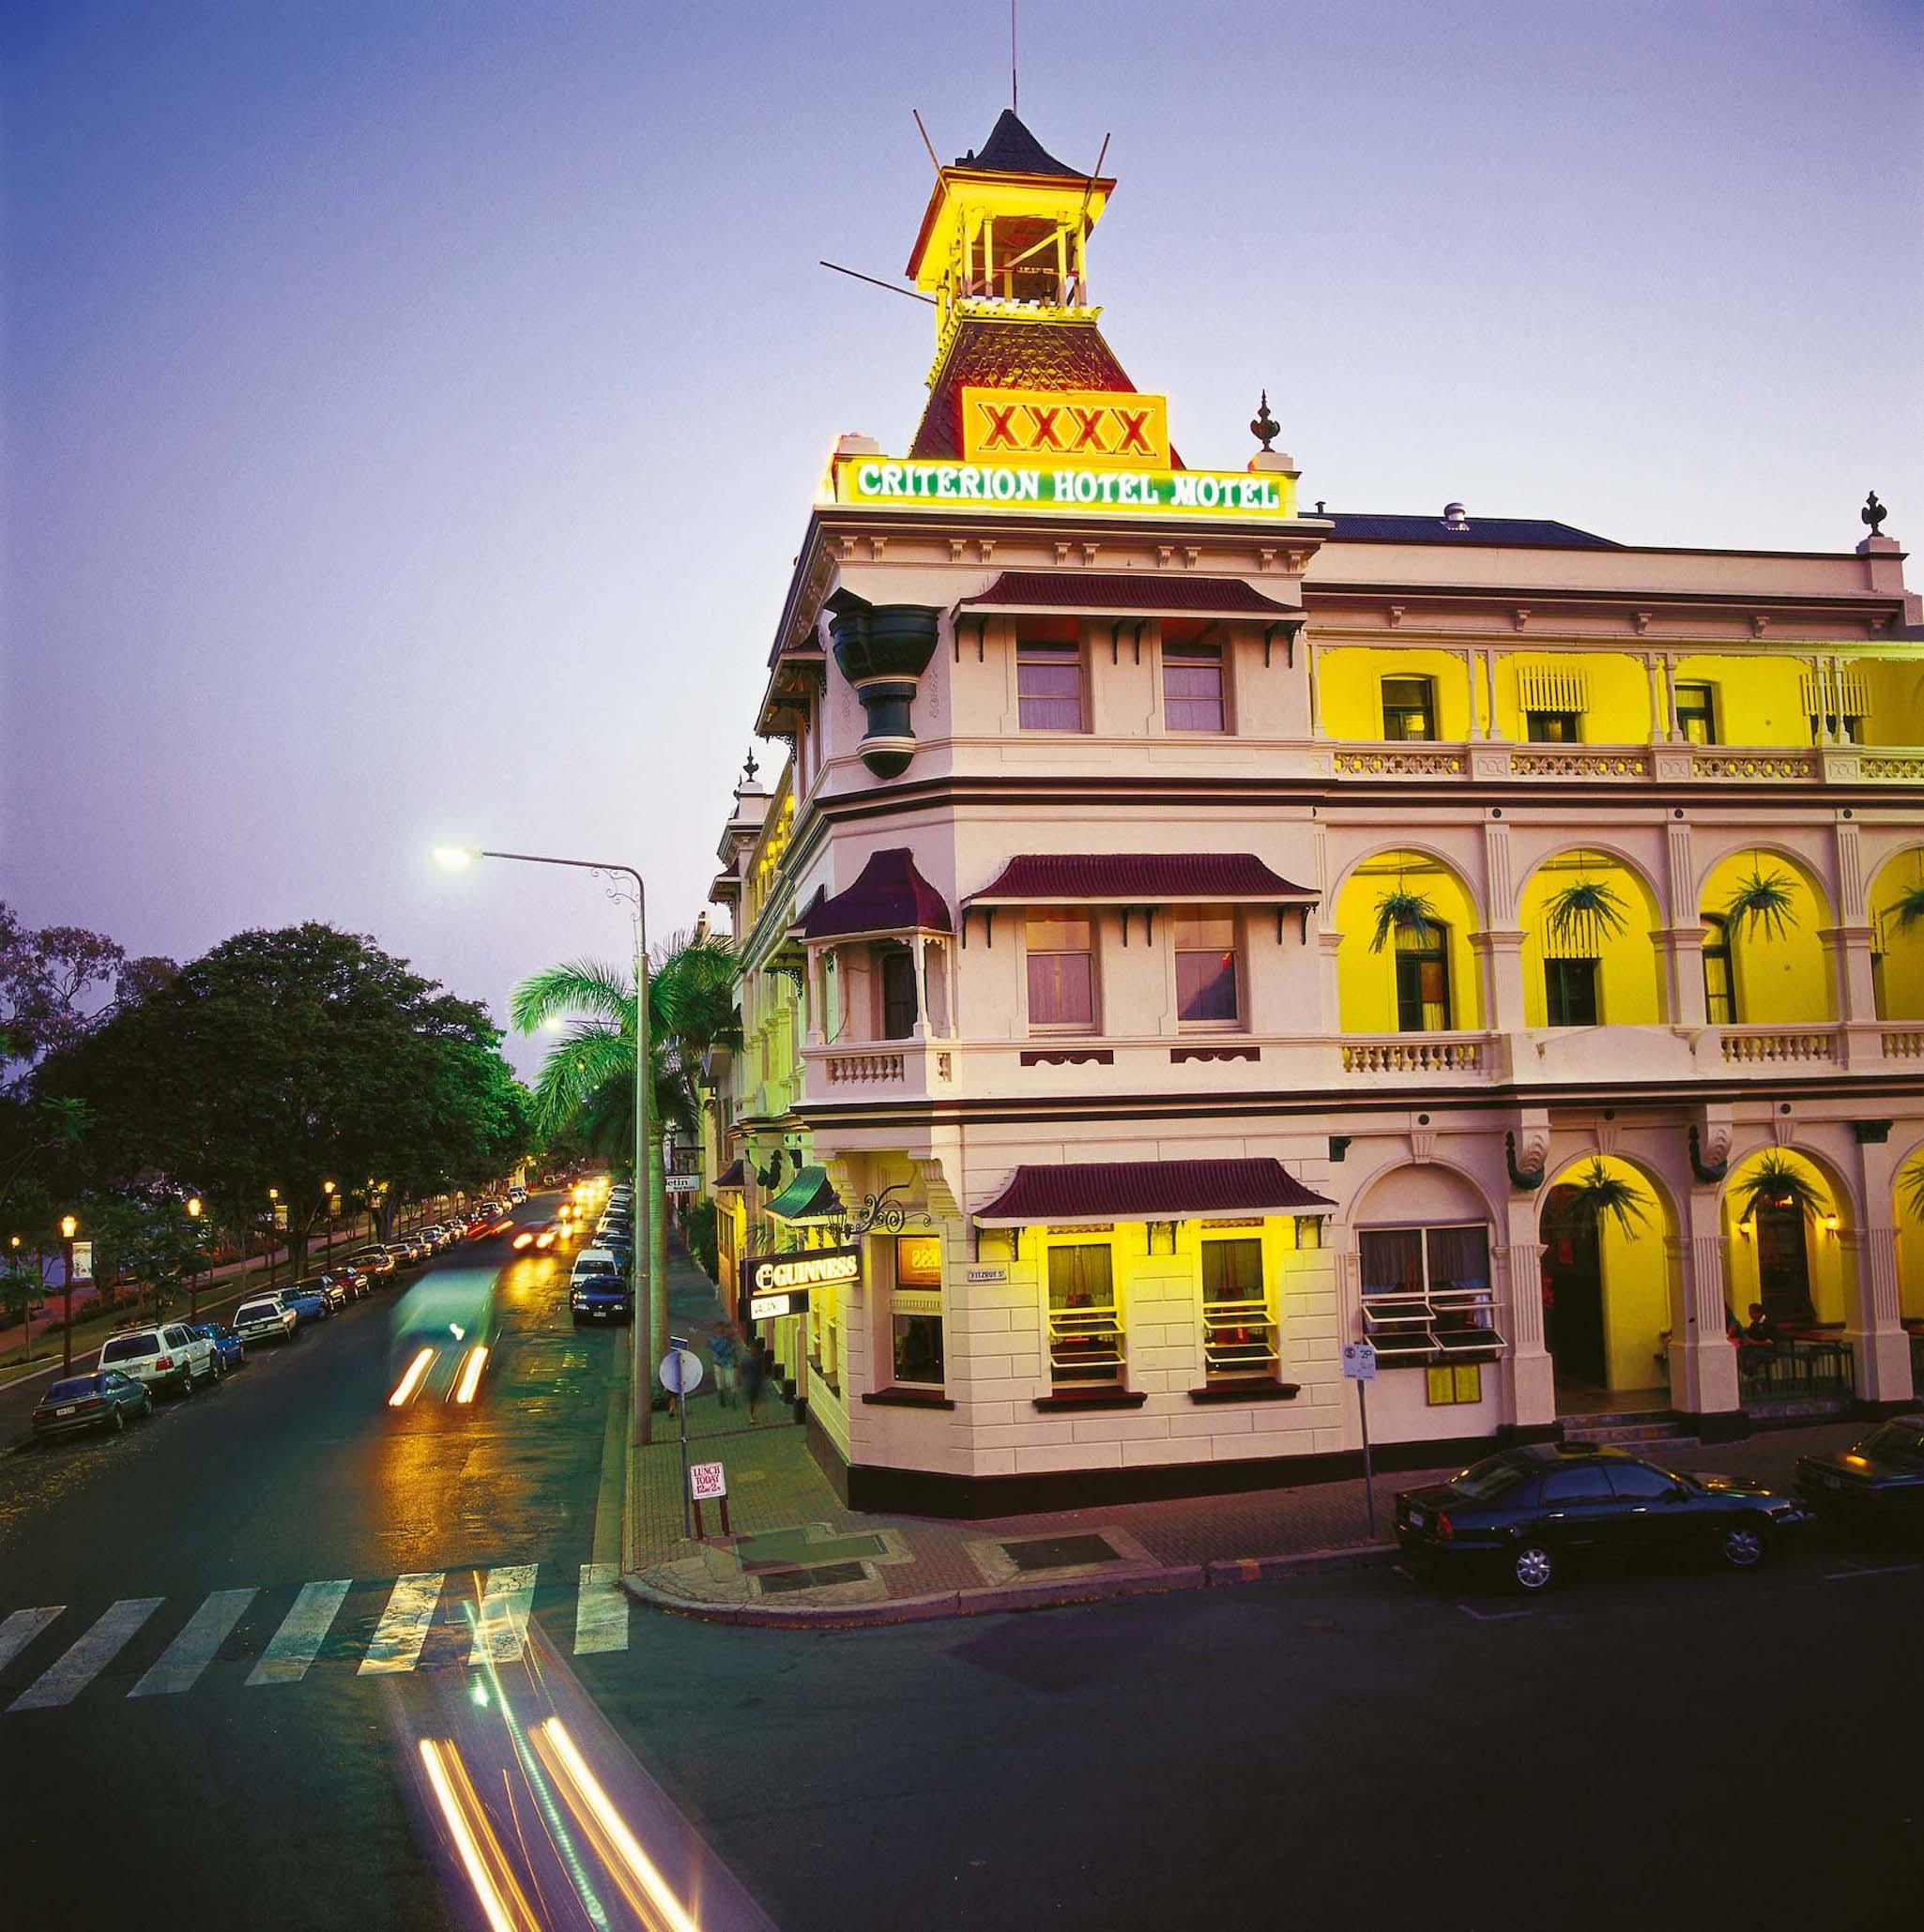 Criterion-hotel-qld-pub-accommodation